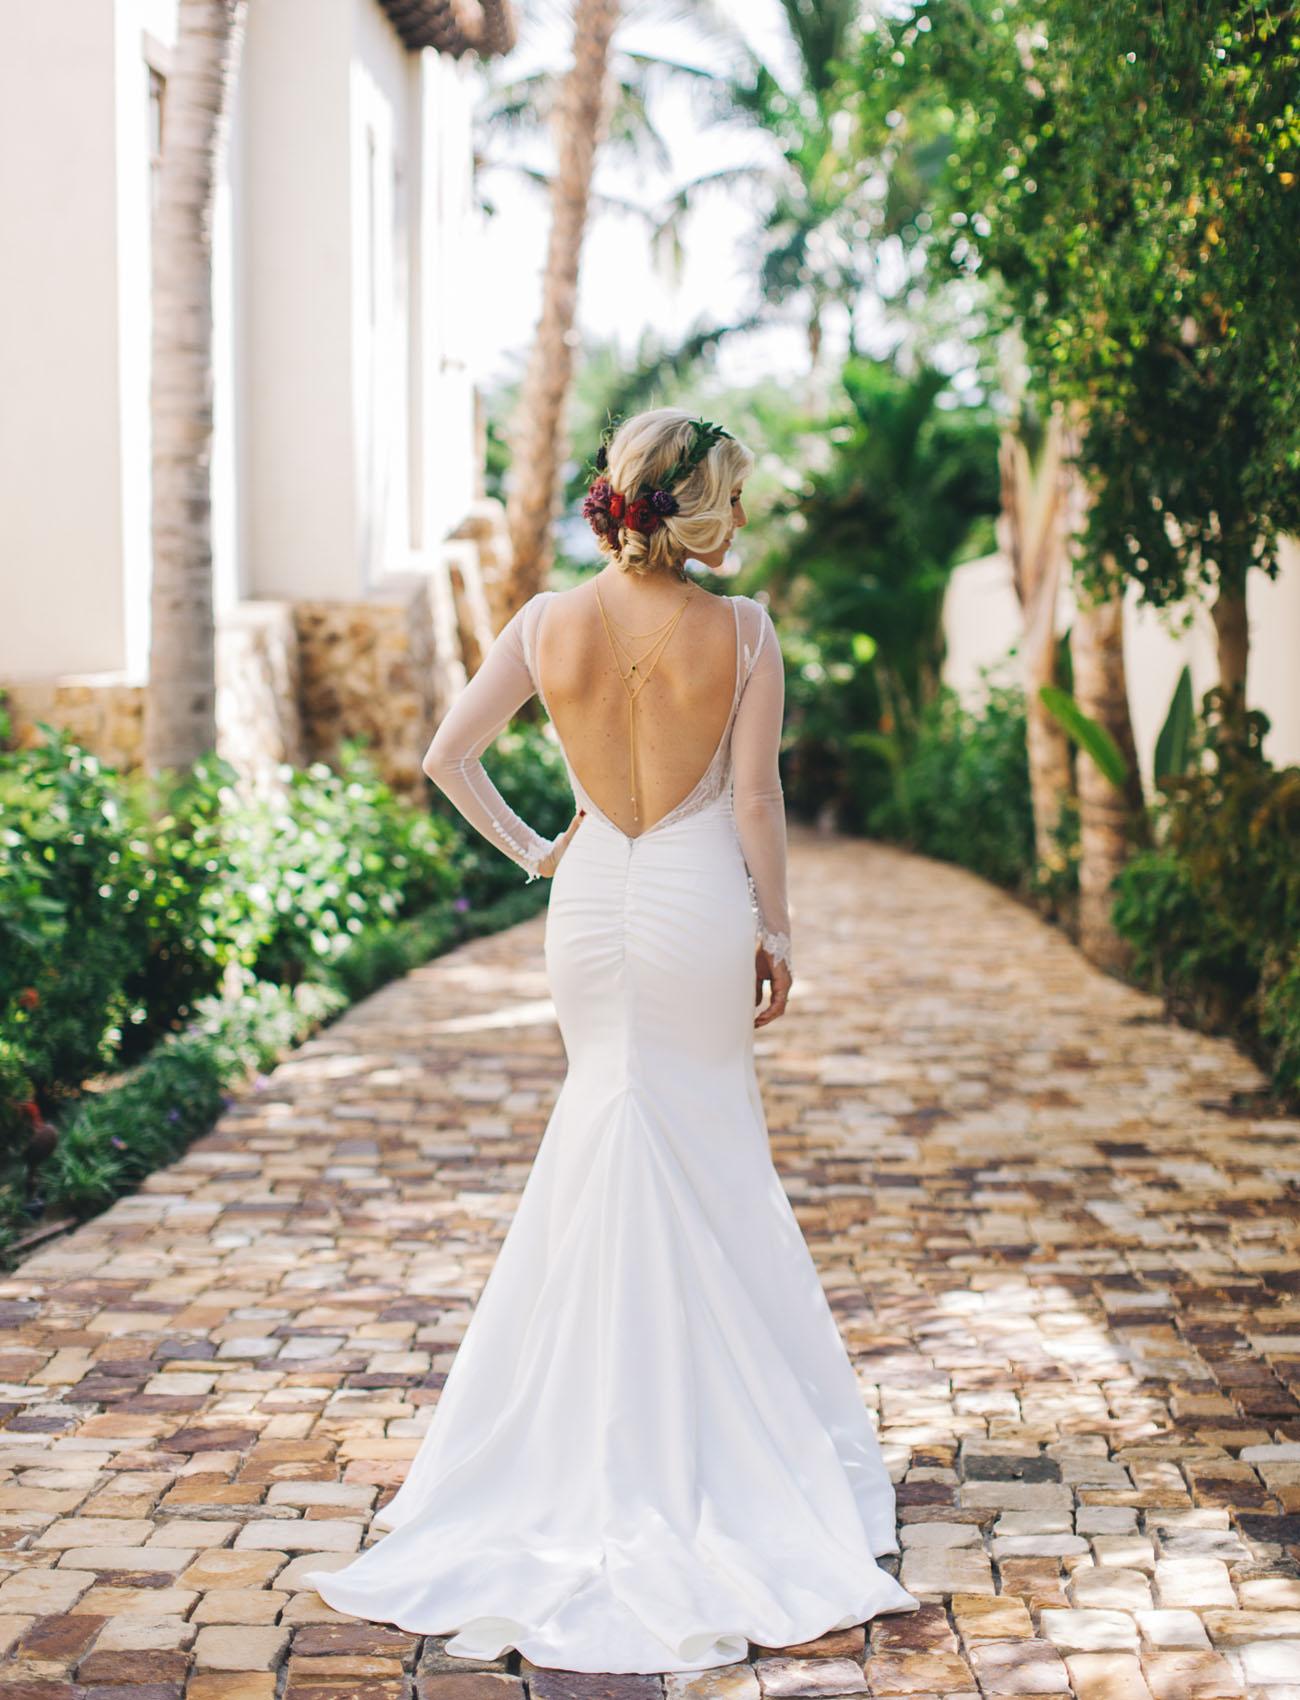 Mexico Wedding Dress 7 Cute Katie May Wedding Dress